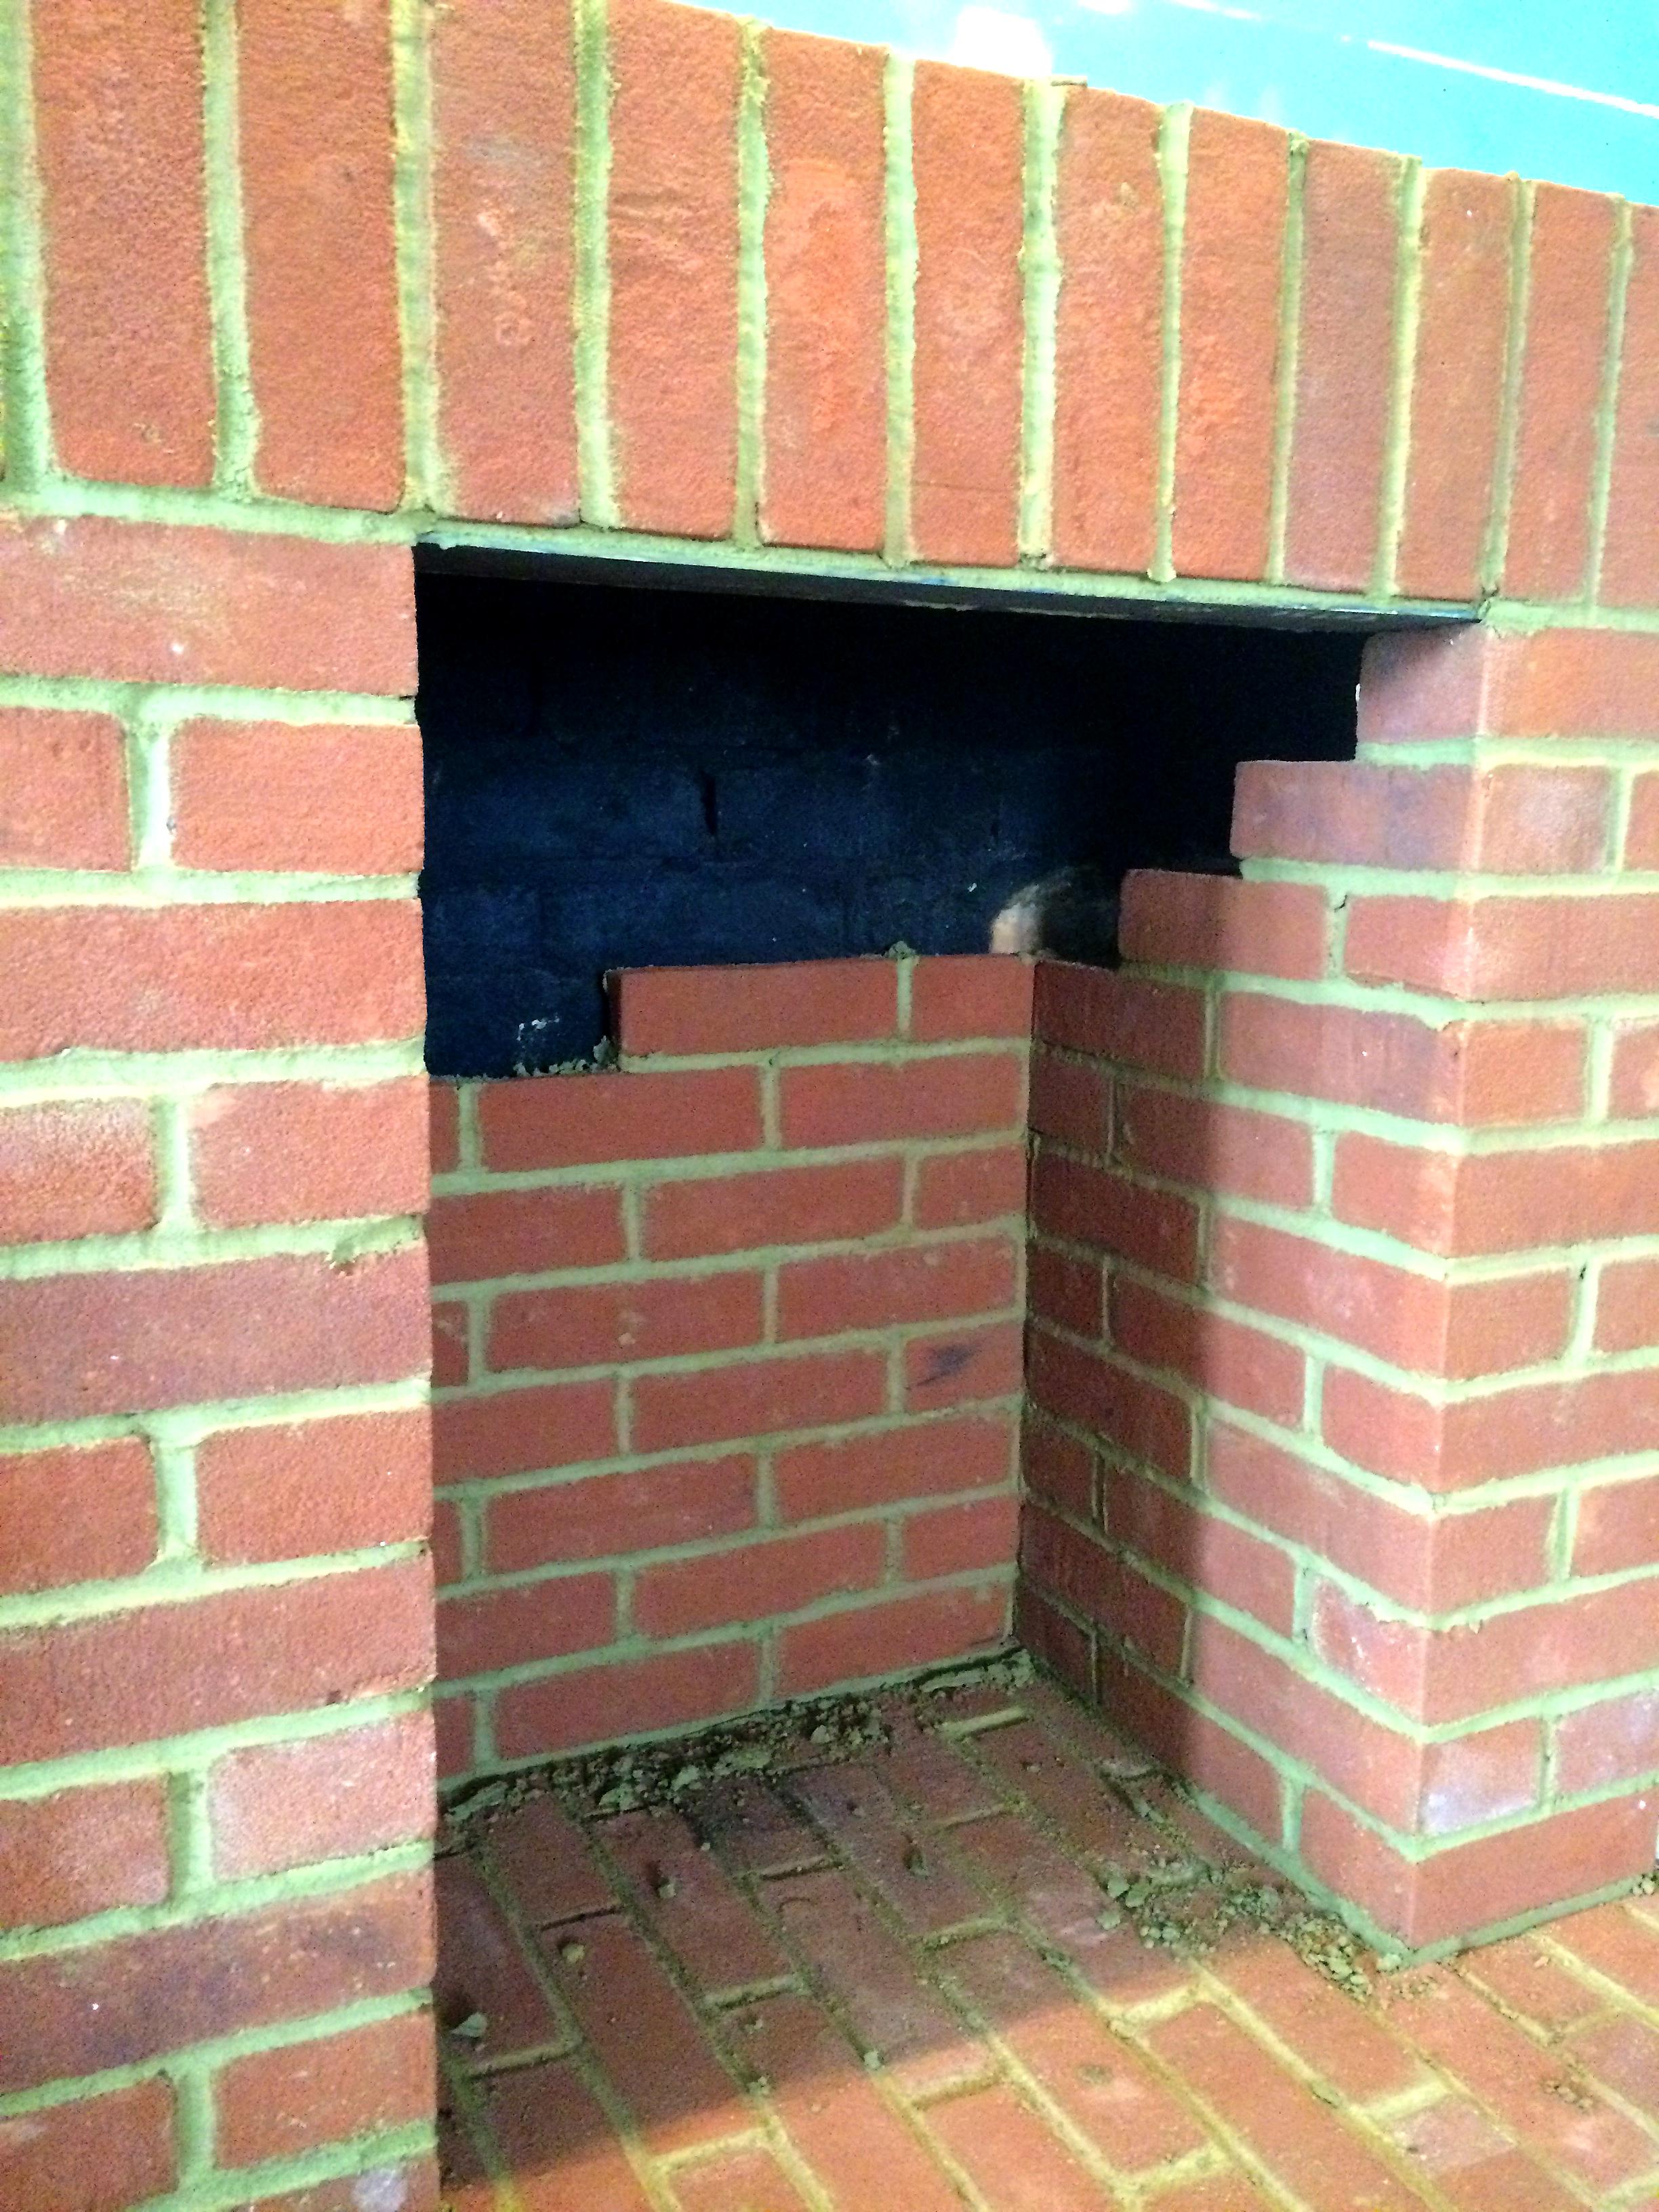 Brick Fireplace Surround Alton Hampshire Fire Bug Wood